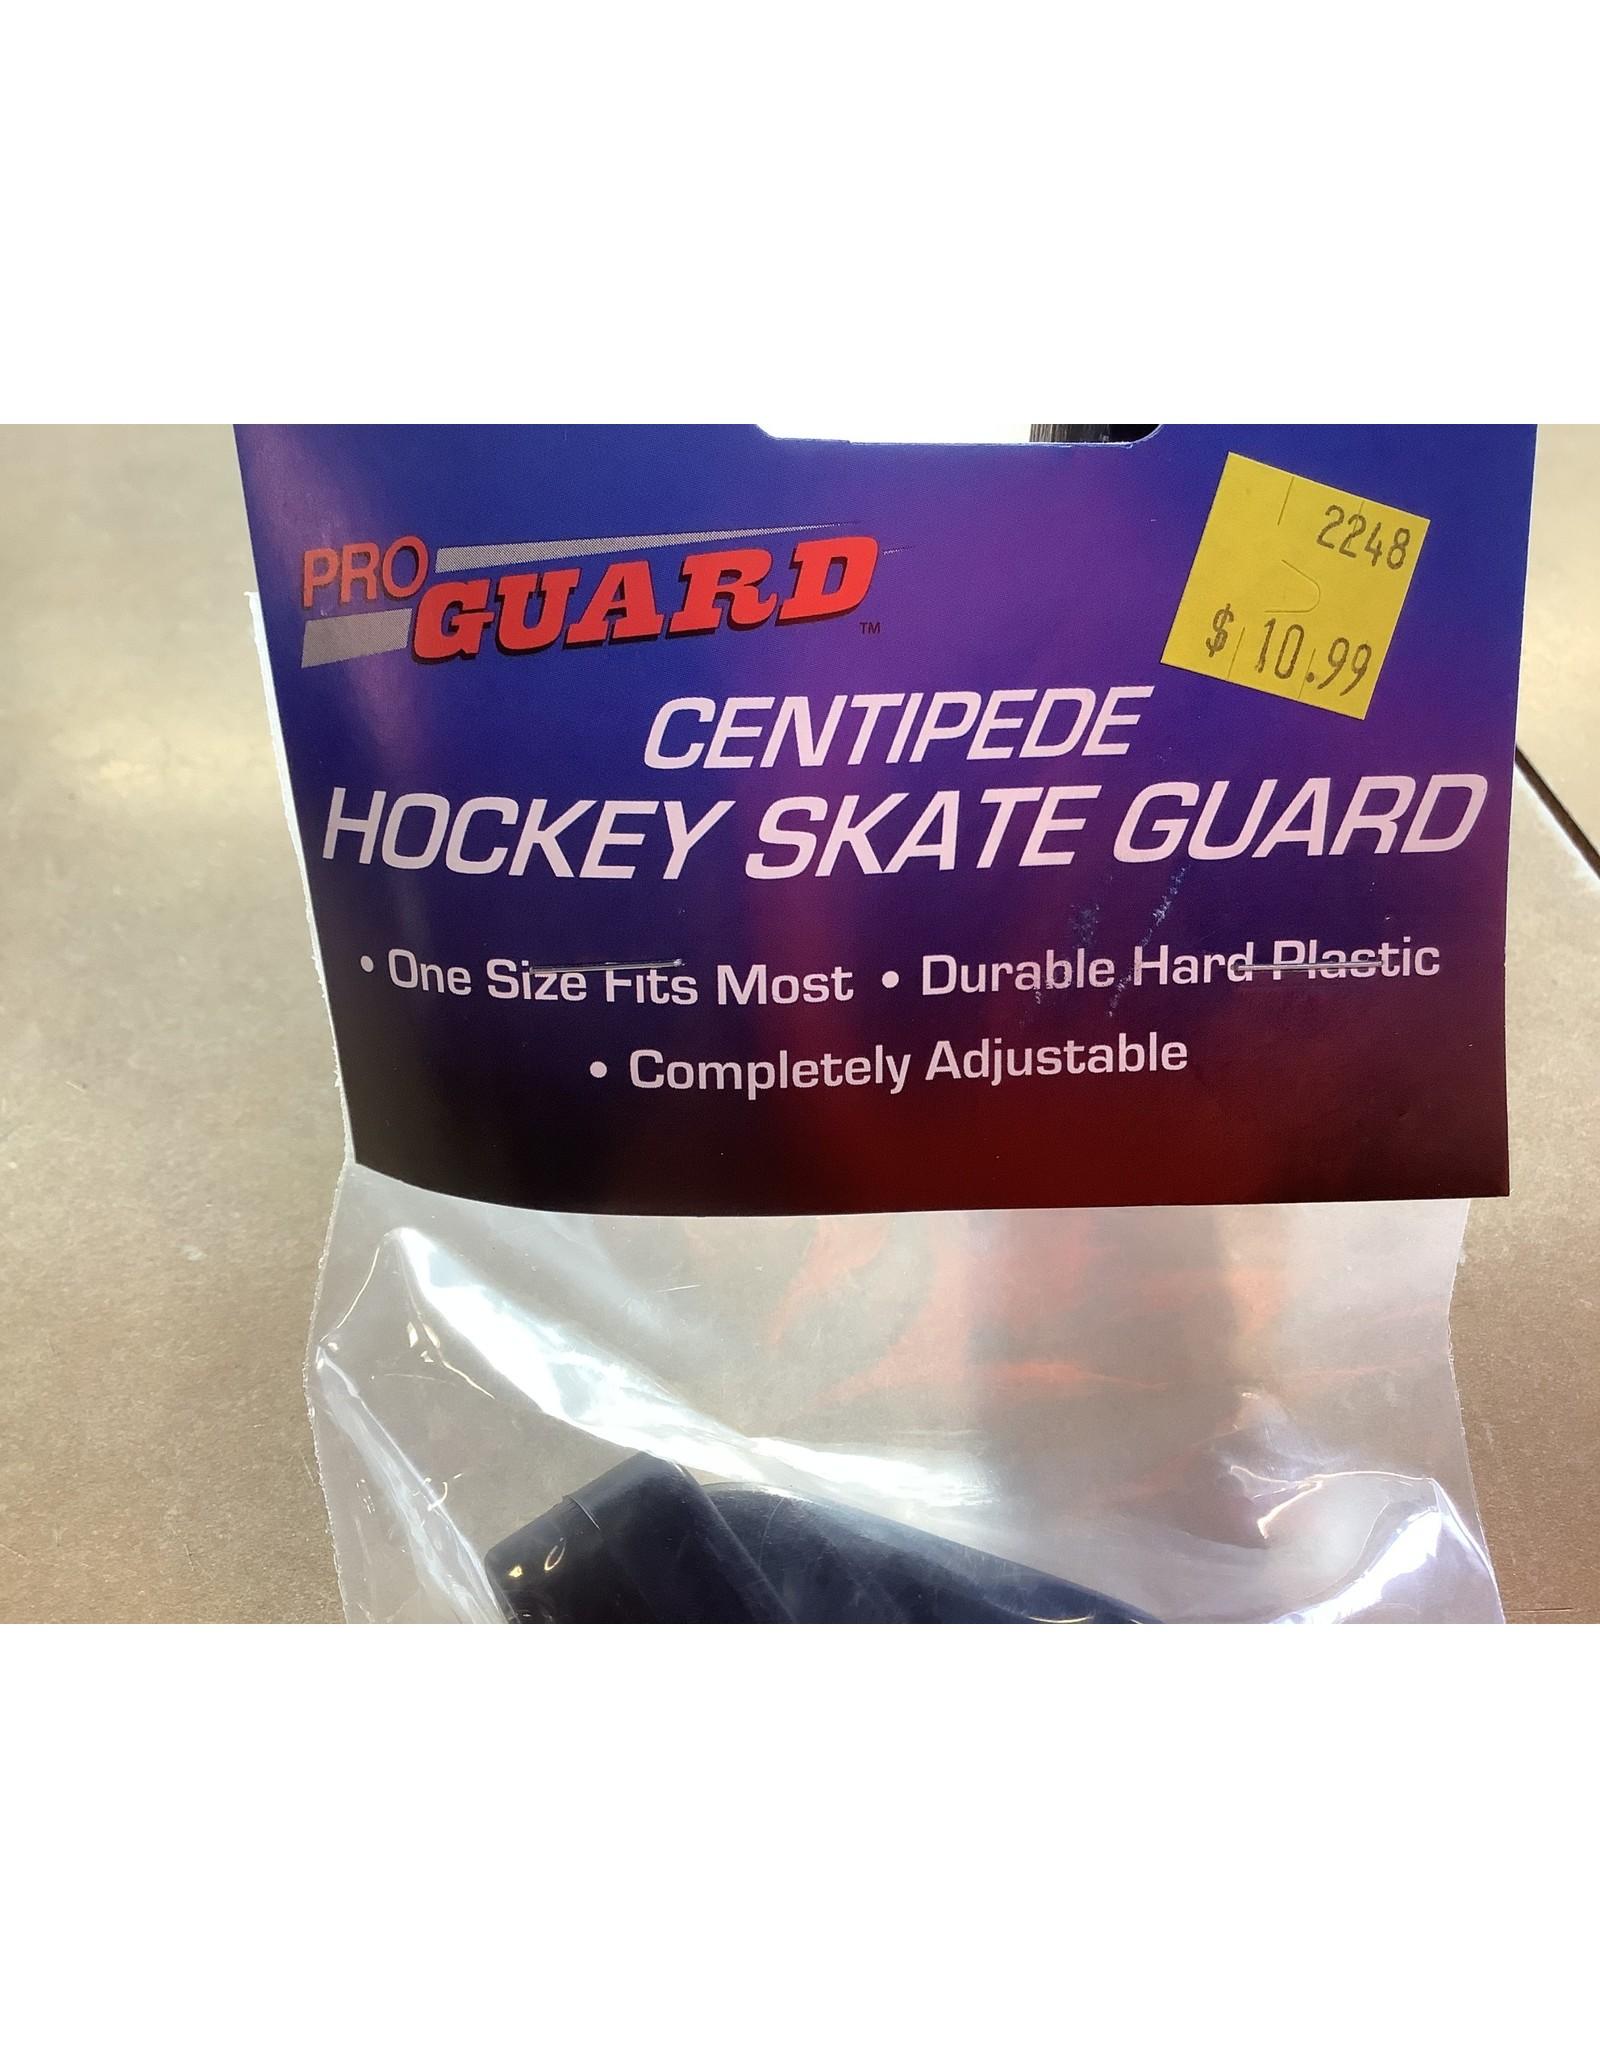 PROGUARD Centipede Hockey Skate Guard